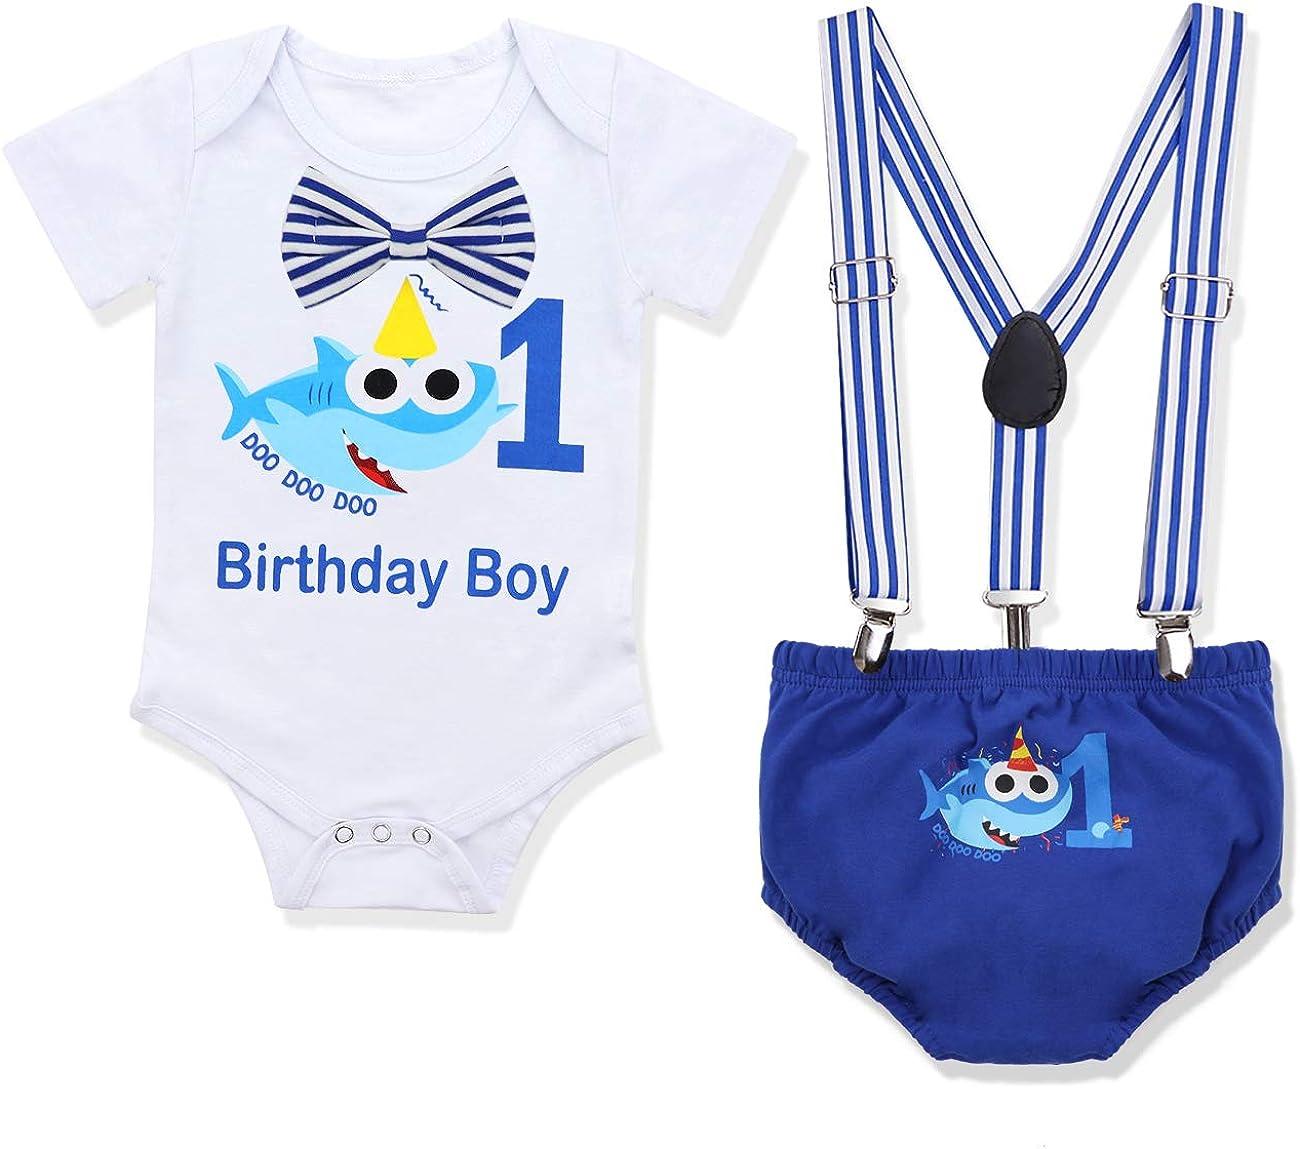 Baby Boy Clothes Shark Doo Doo Doo Print Summer Cotton Sleeveless Outfits Set Tops + Short Pants